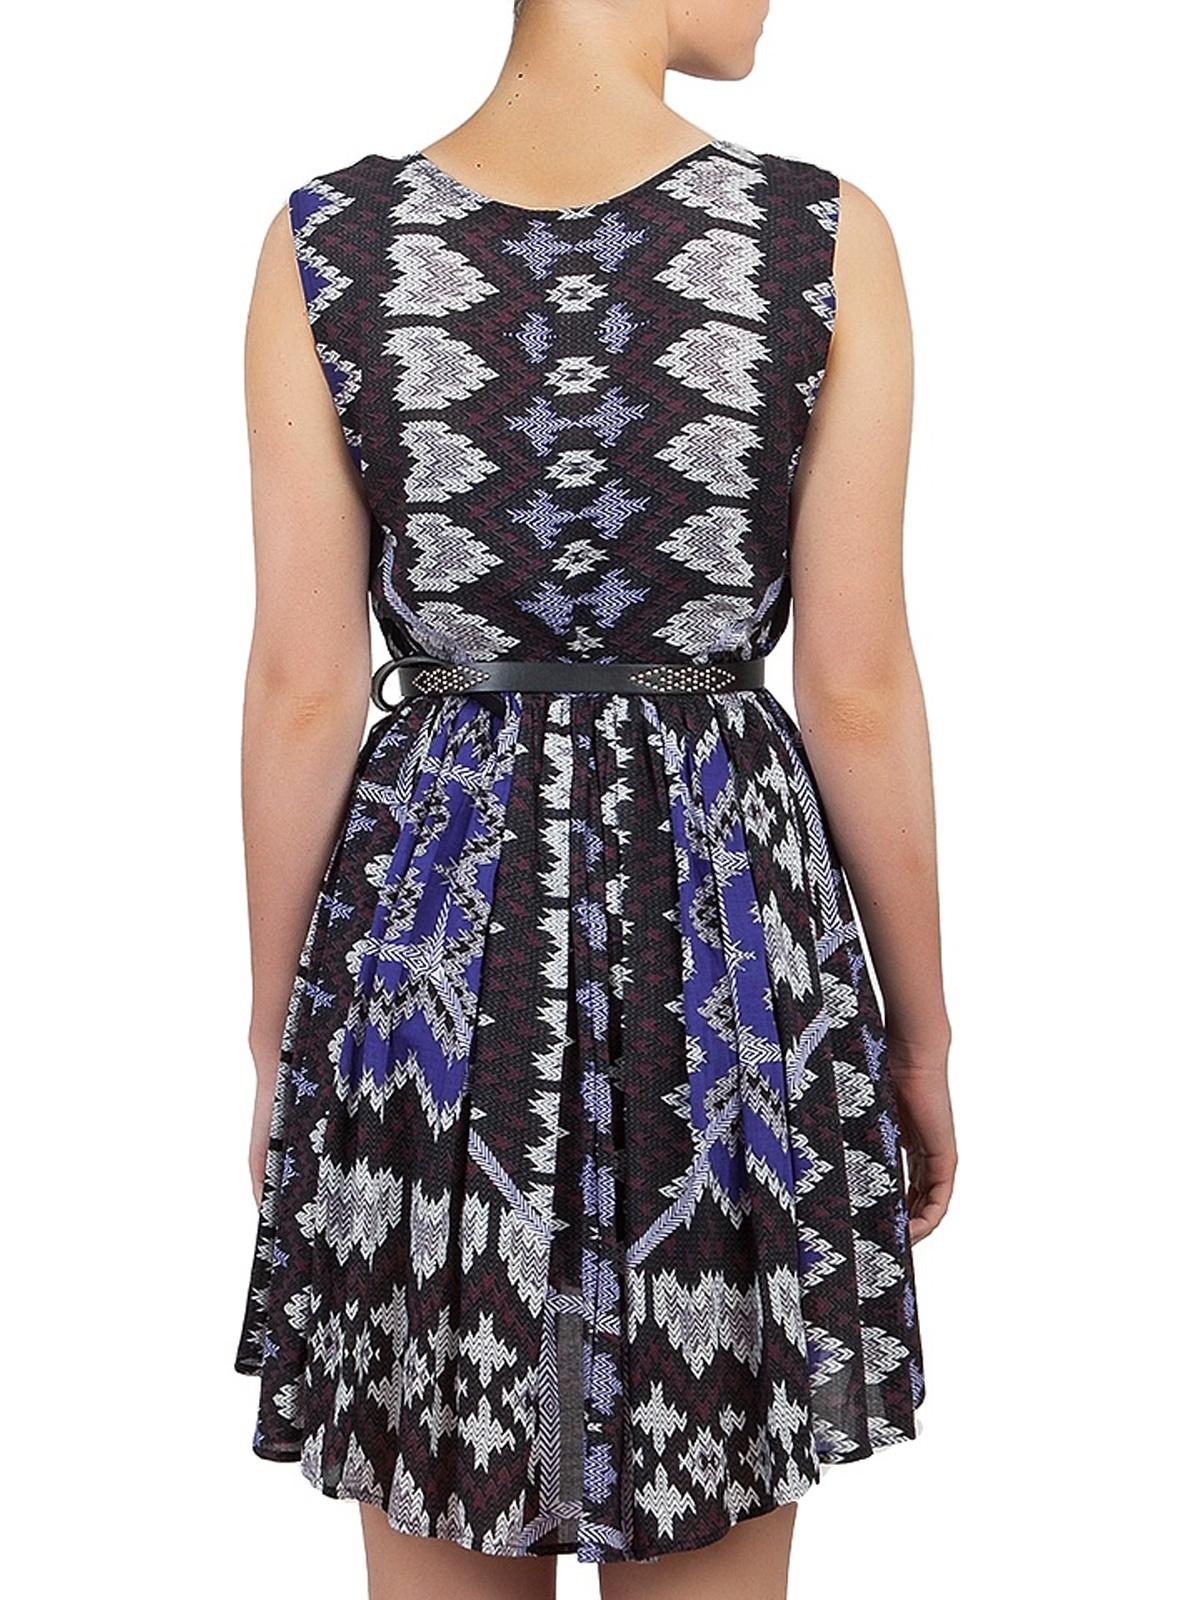 Free People | Take Me To Thailand Back and Blue Ikat Dress | GIRISSIMA.COM